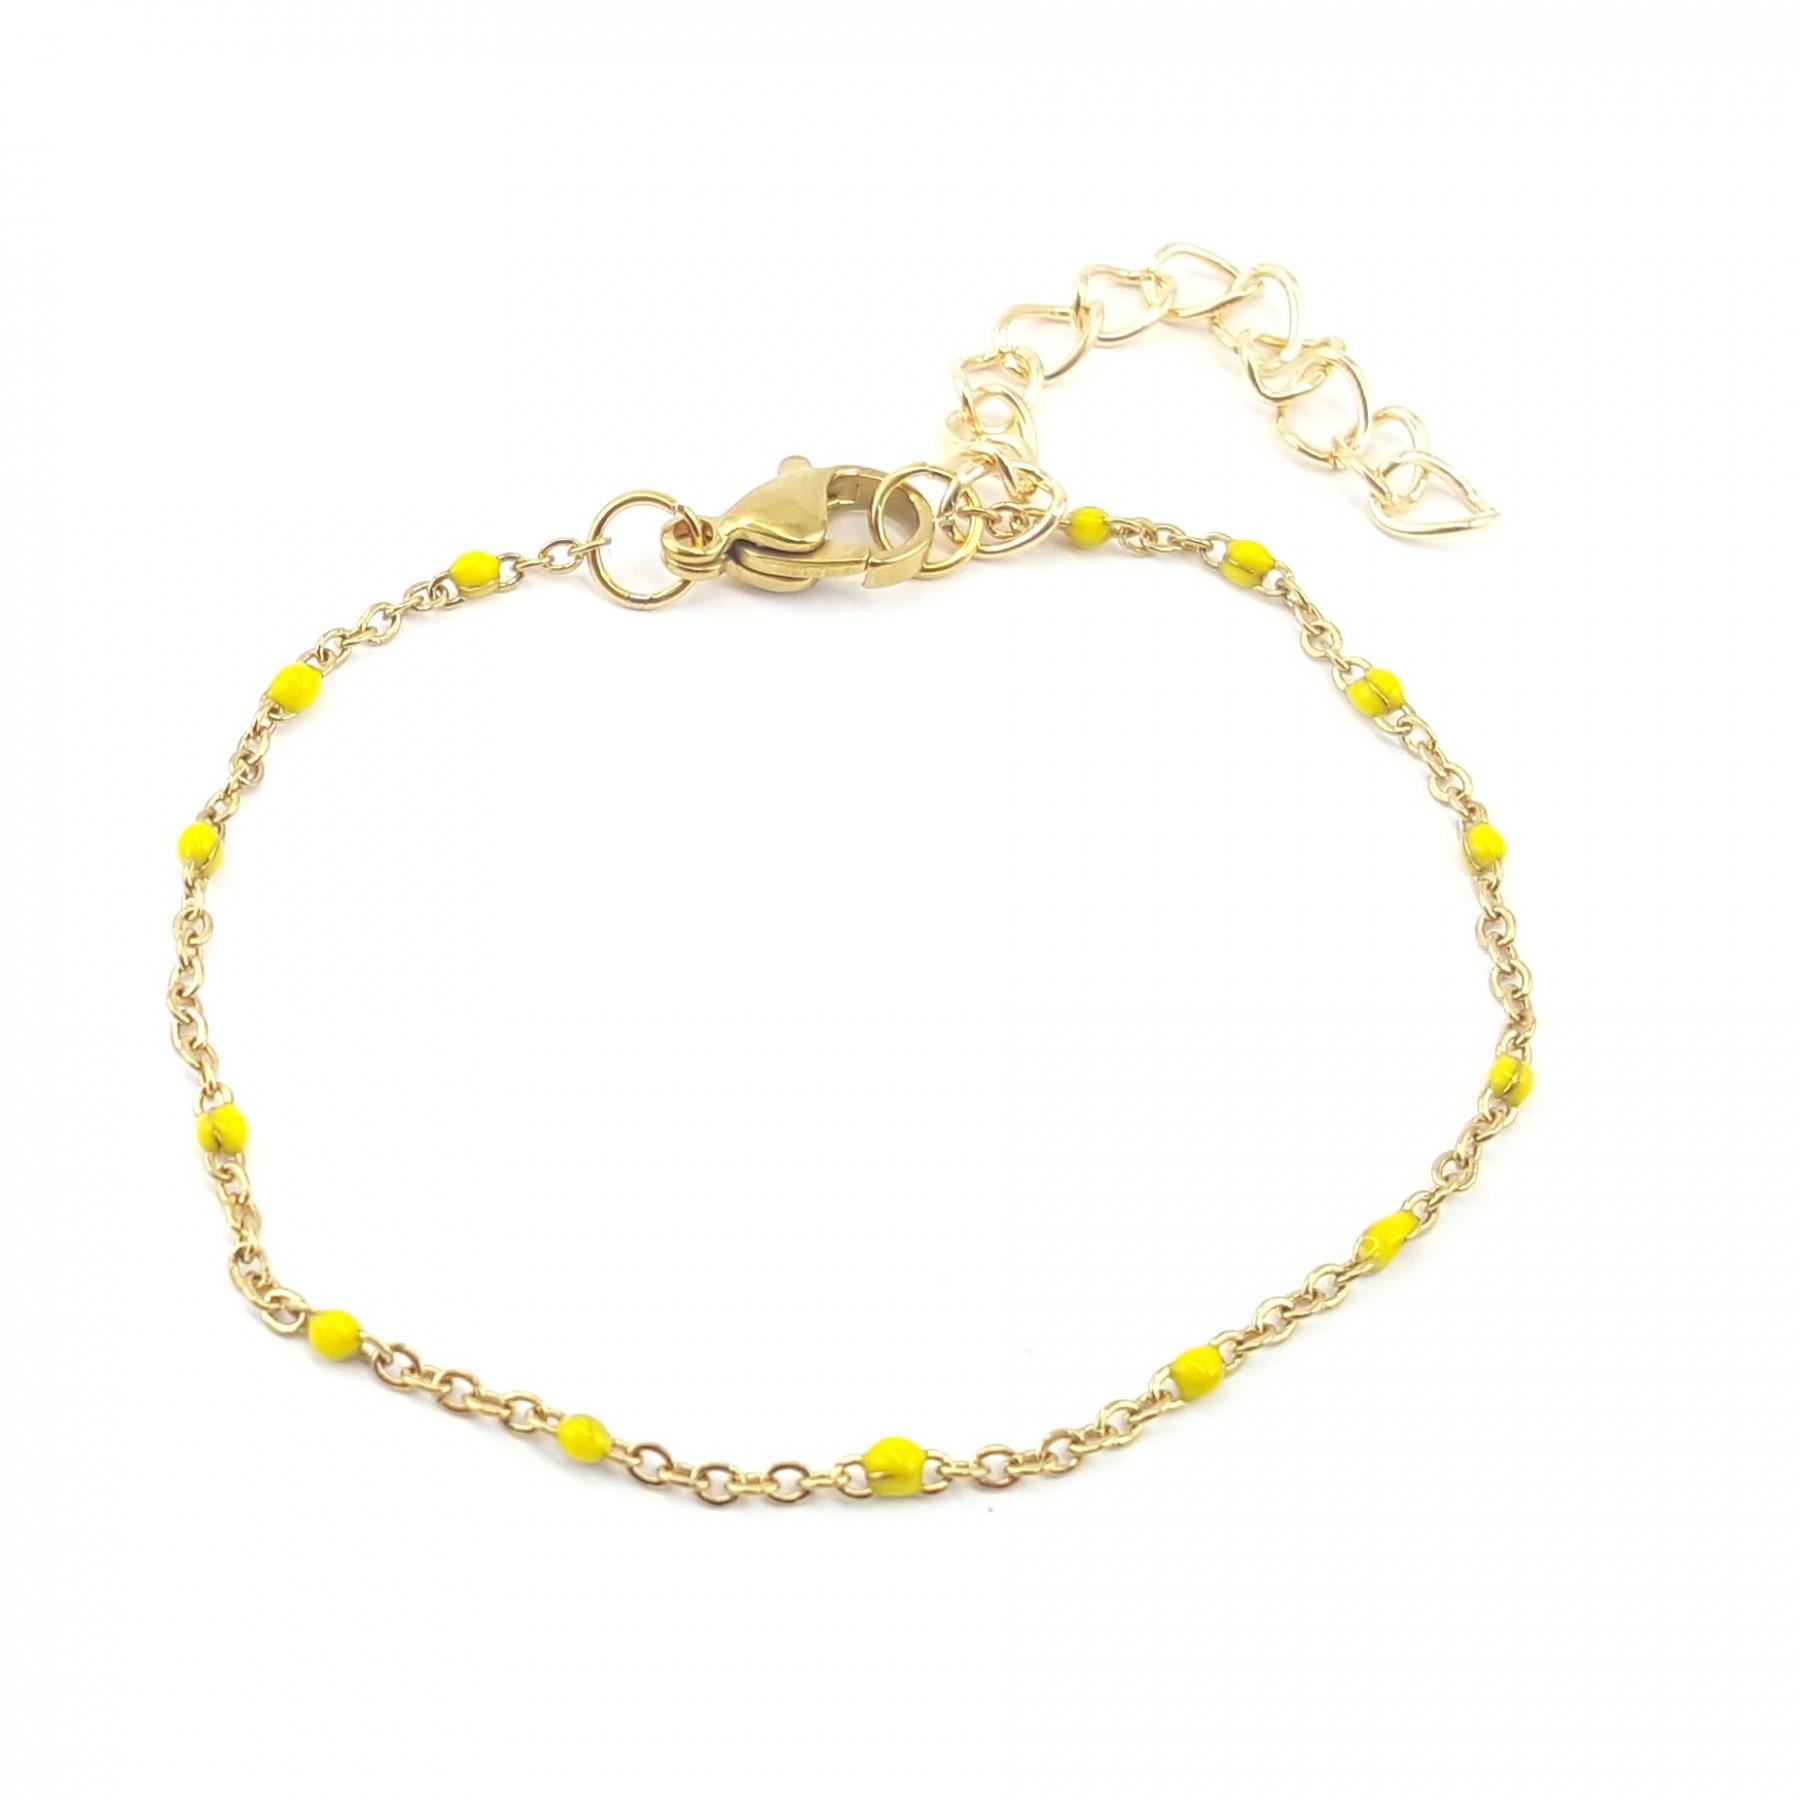 Bracelet émaillage jaune